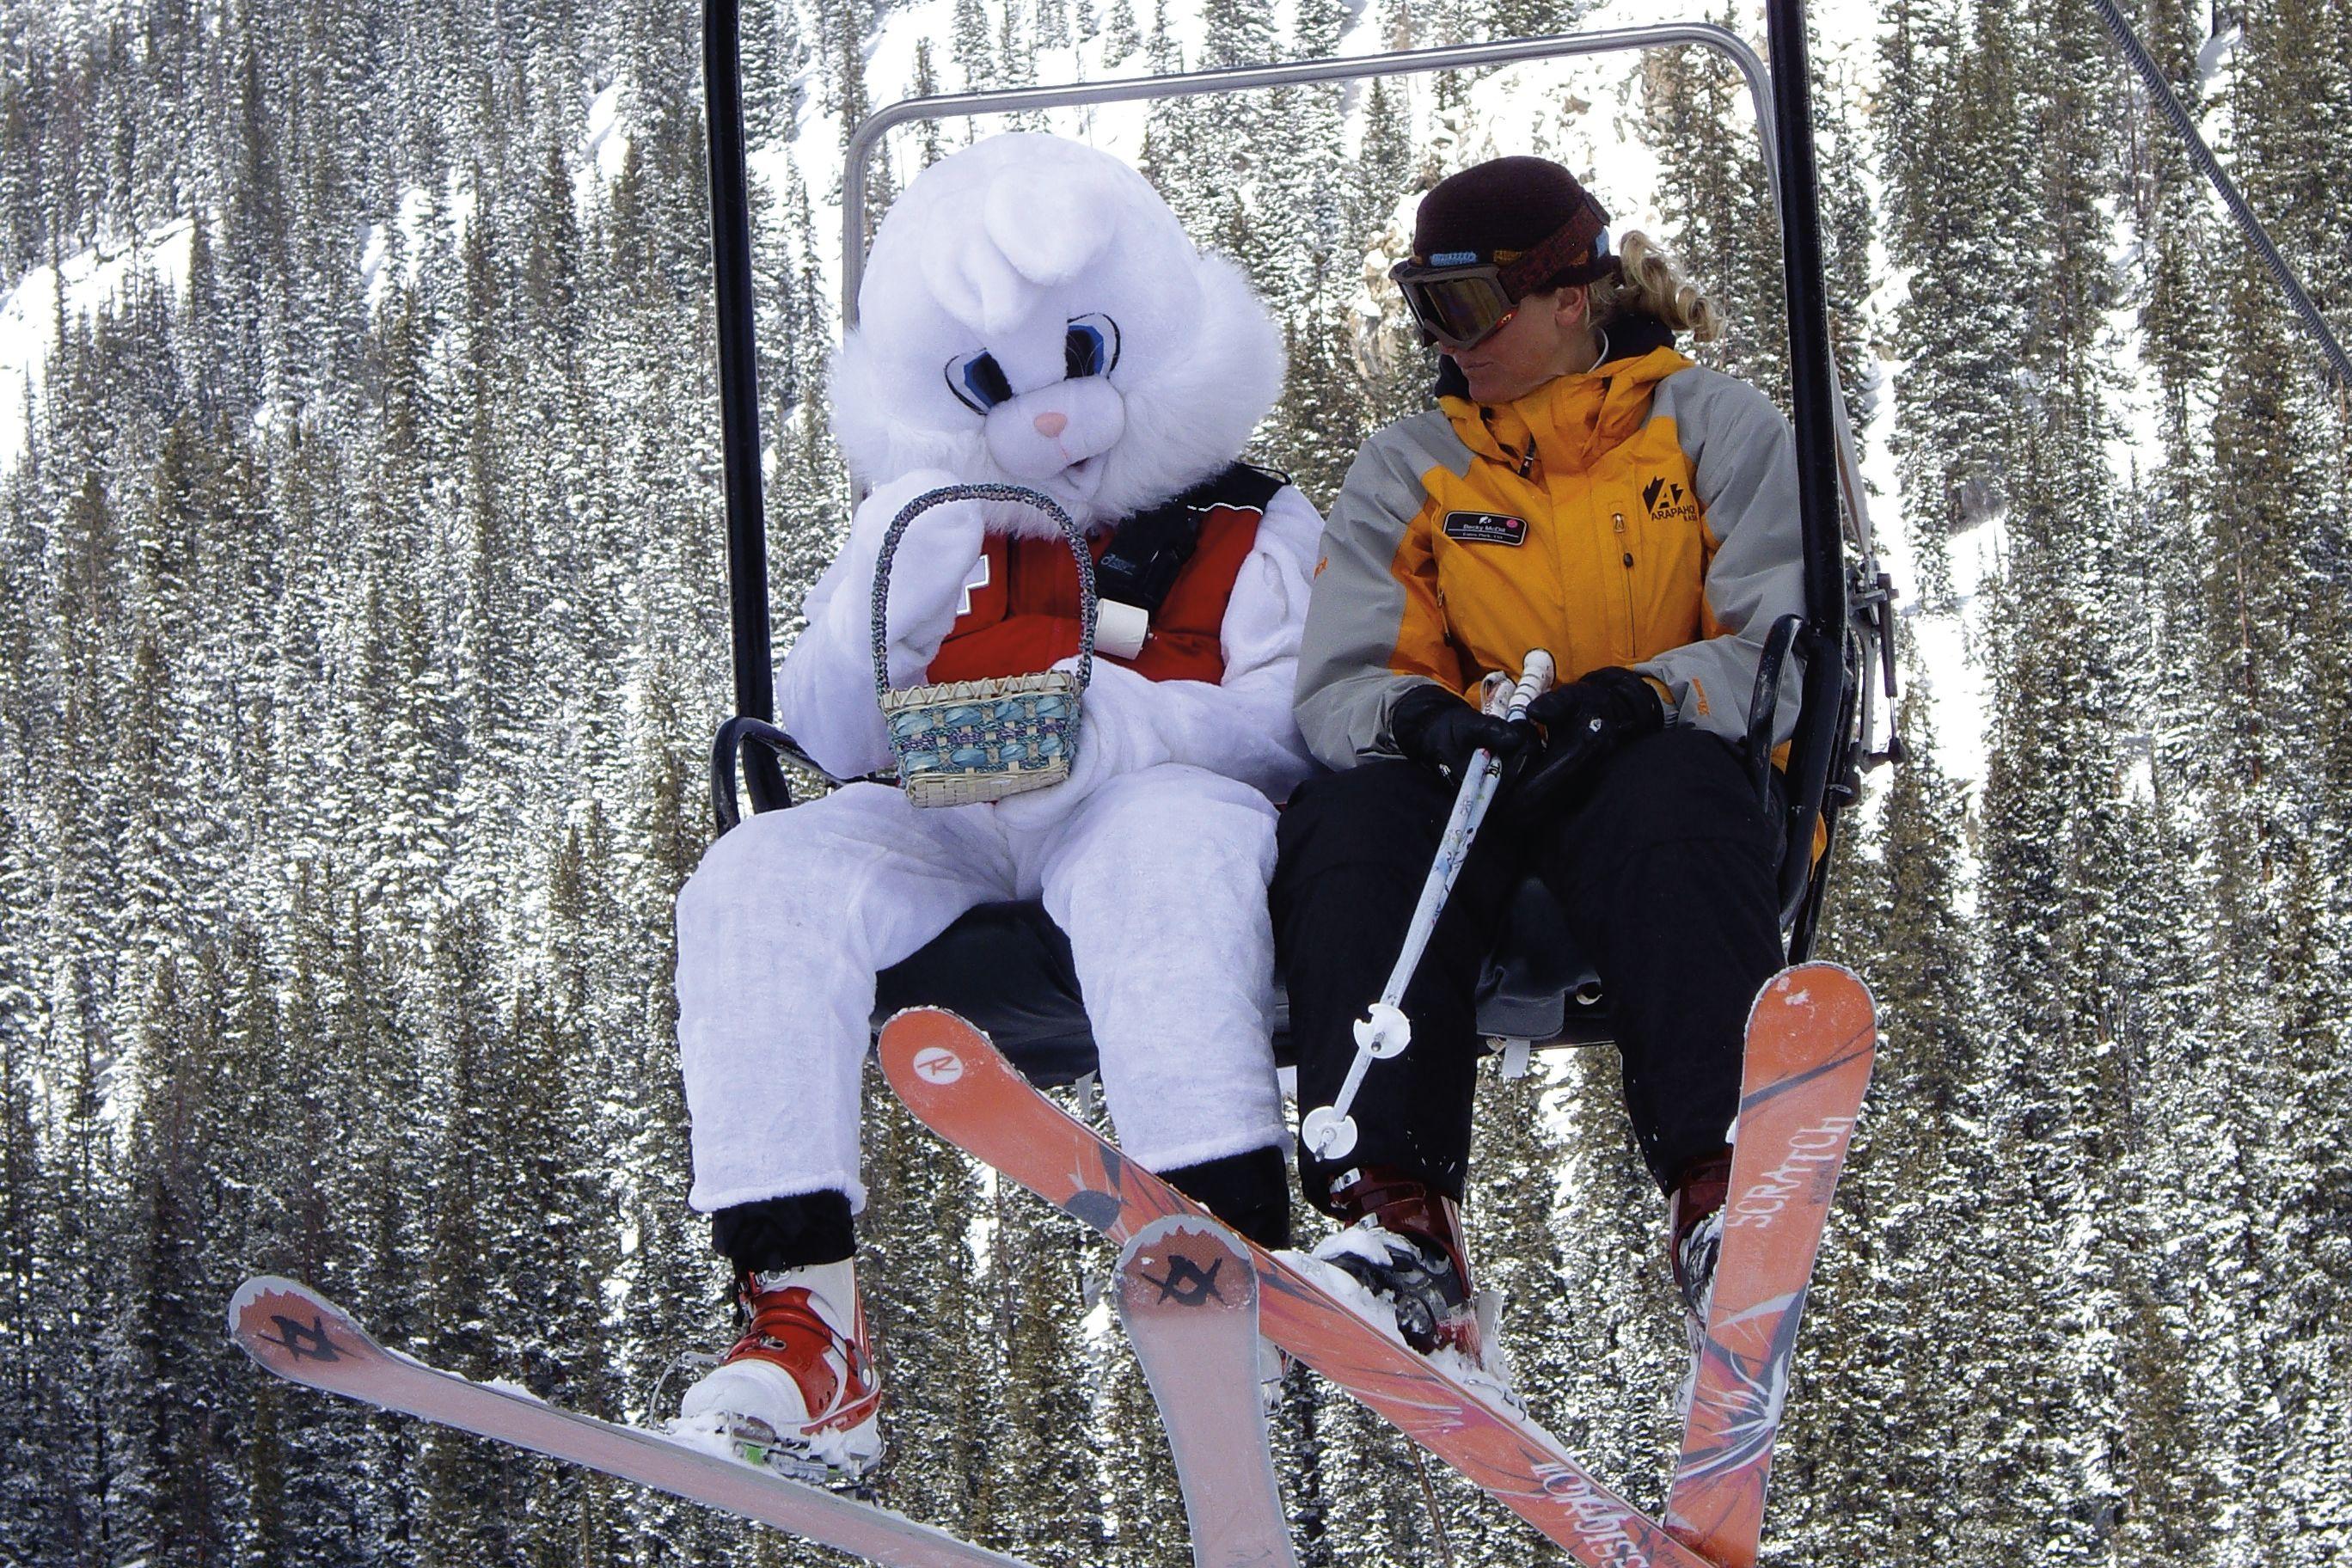 Cosu winter 2012 family egg hunt ski lift aerboy